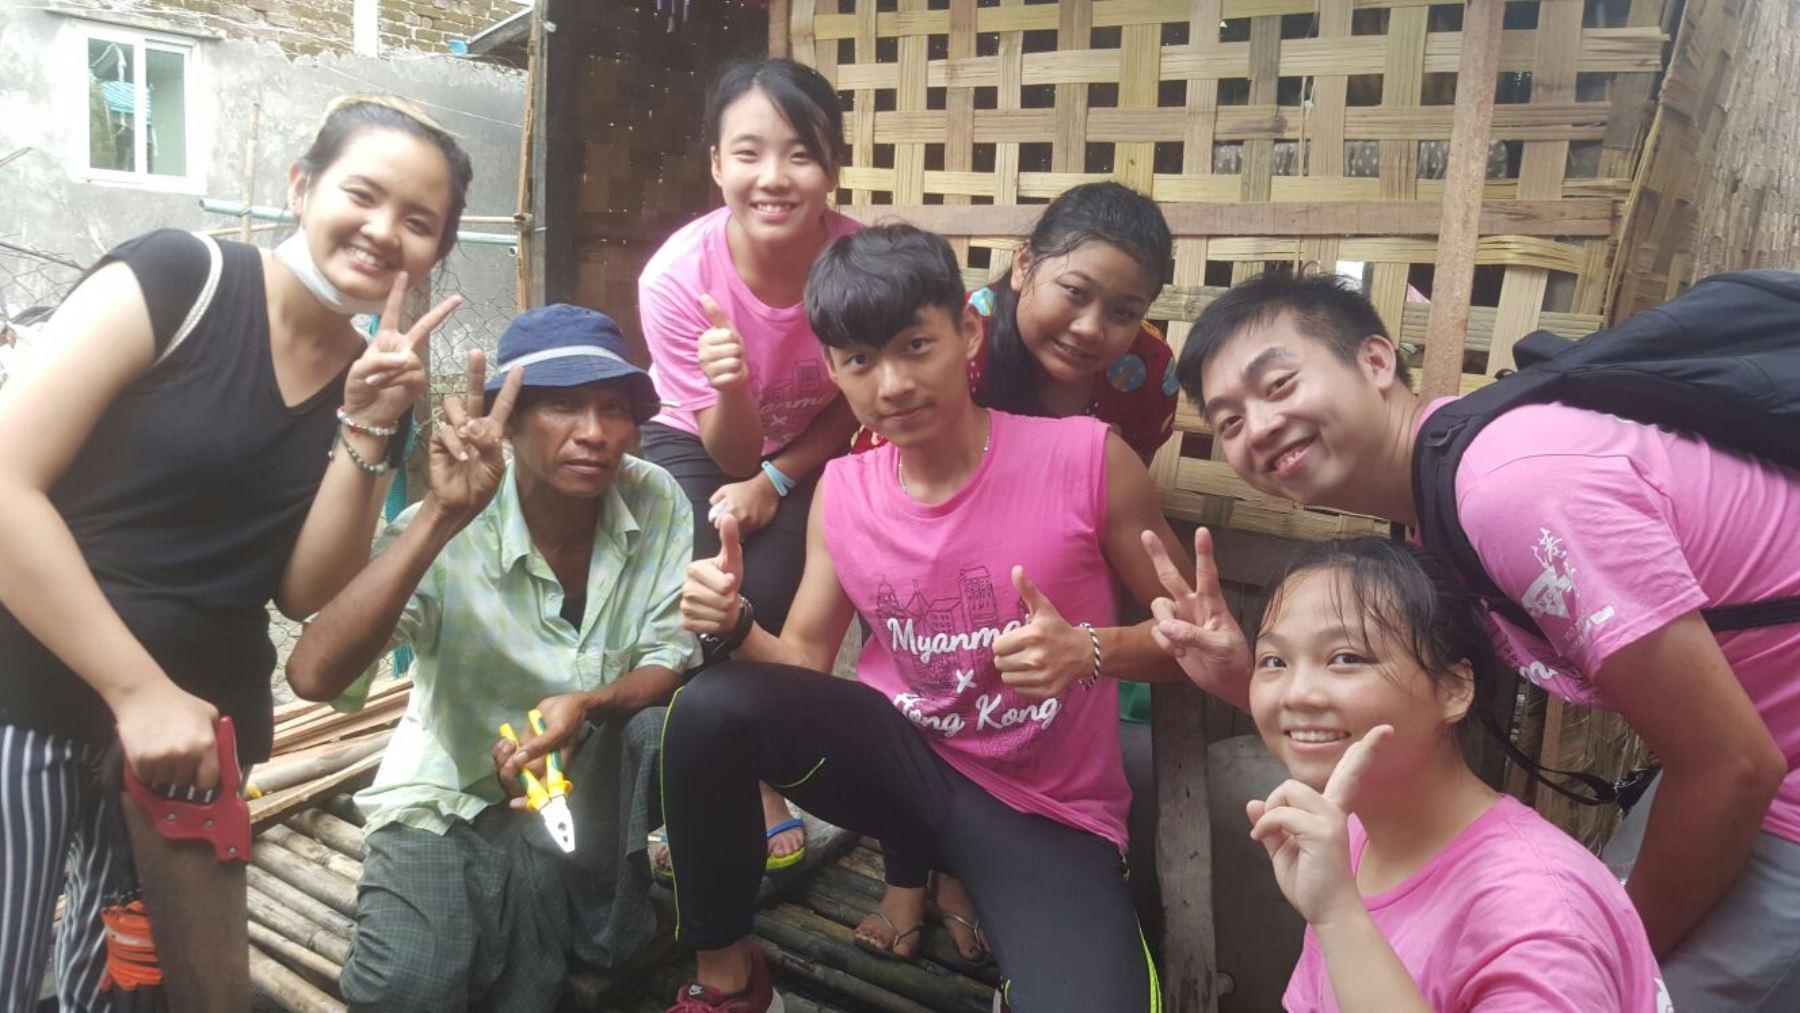 http://www.npc.edu.hk/sites/default/files/mian_dian_yang_guang_ti_yan_fu_wu_tuan_02.jpg